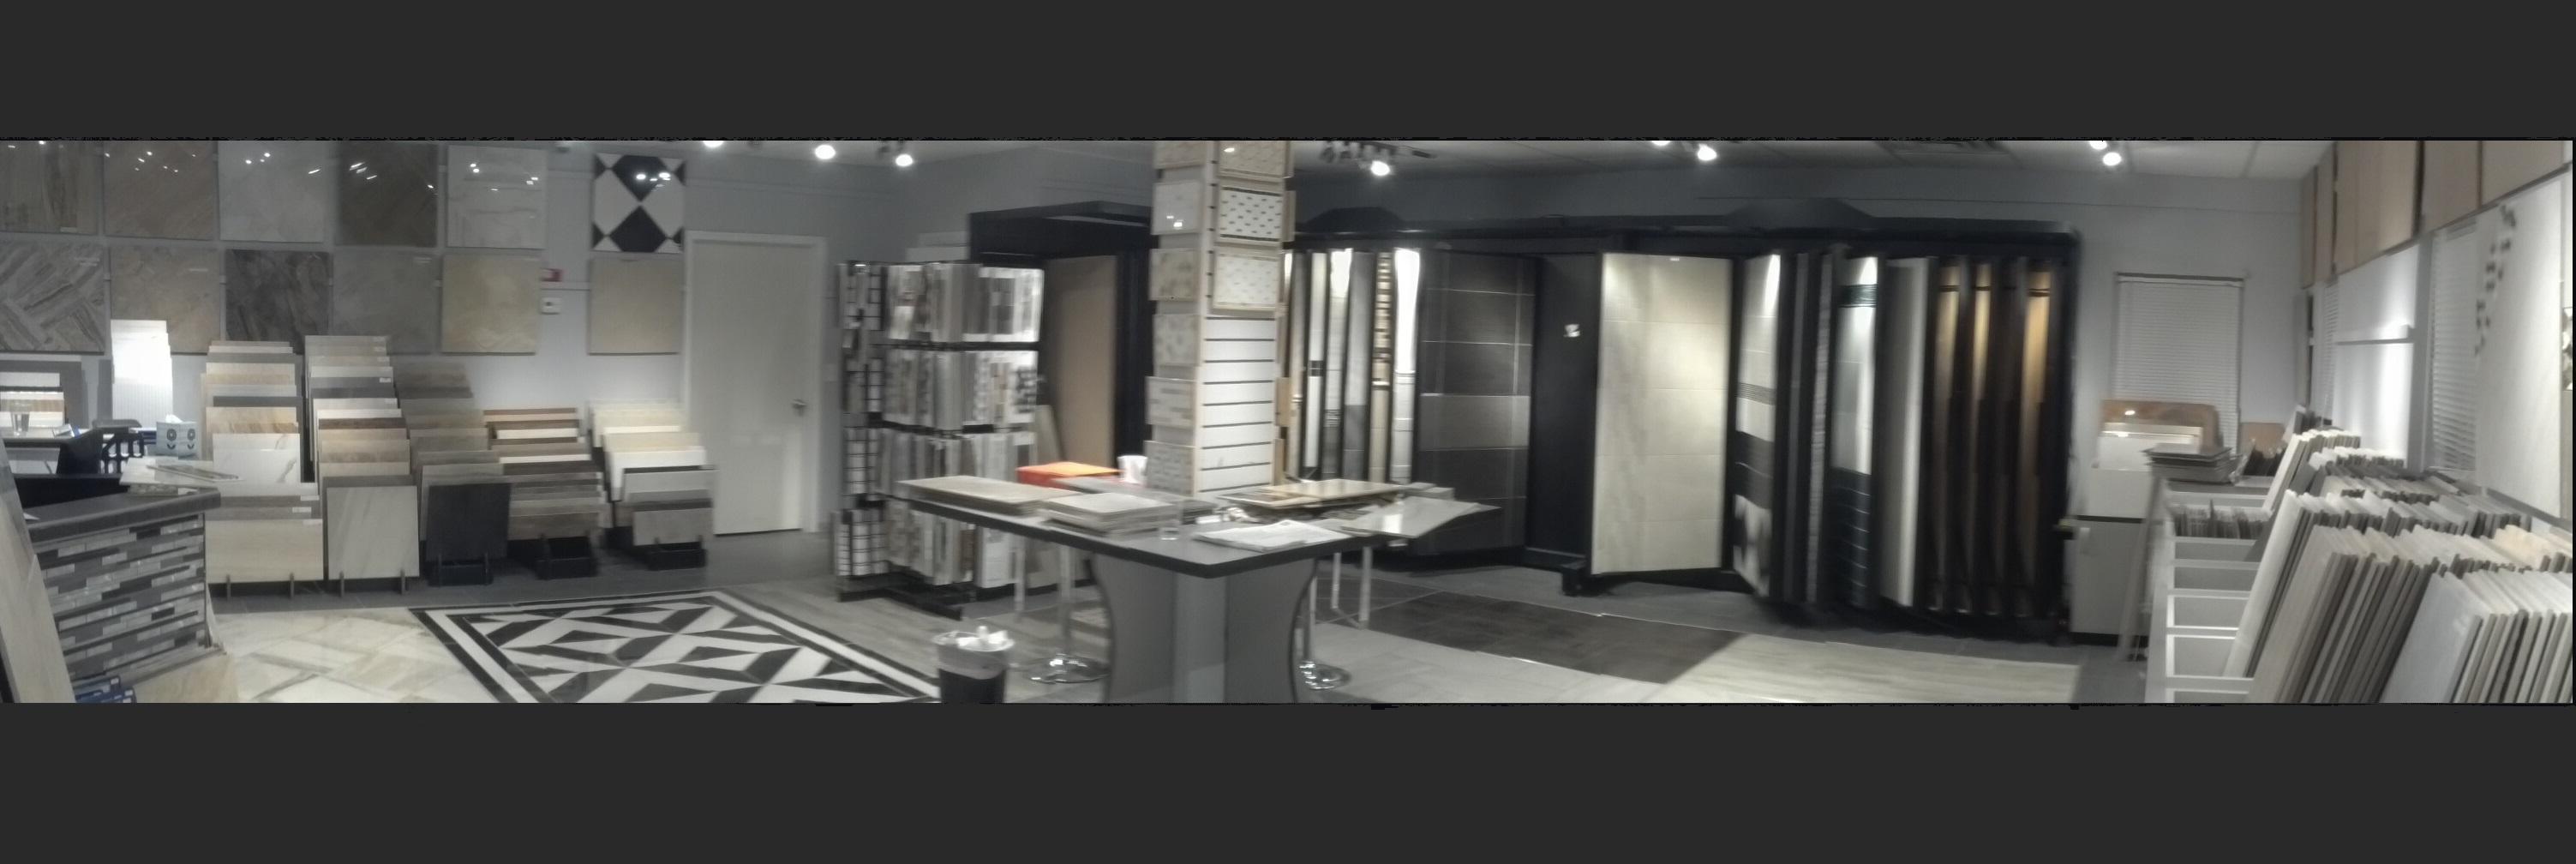 showroomblack2